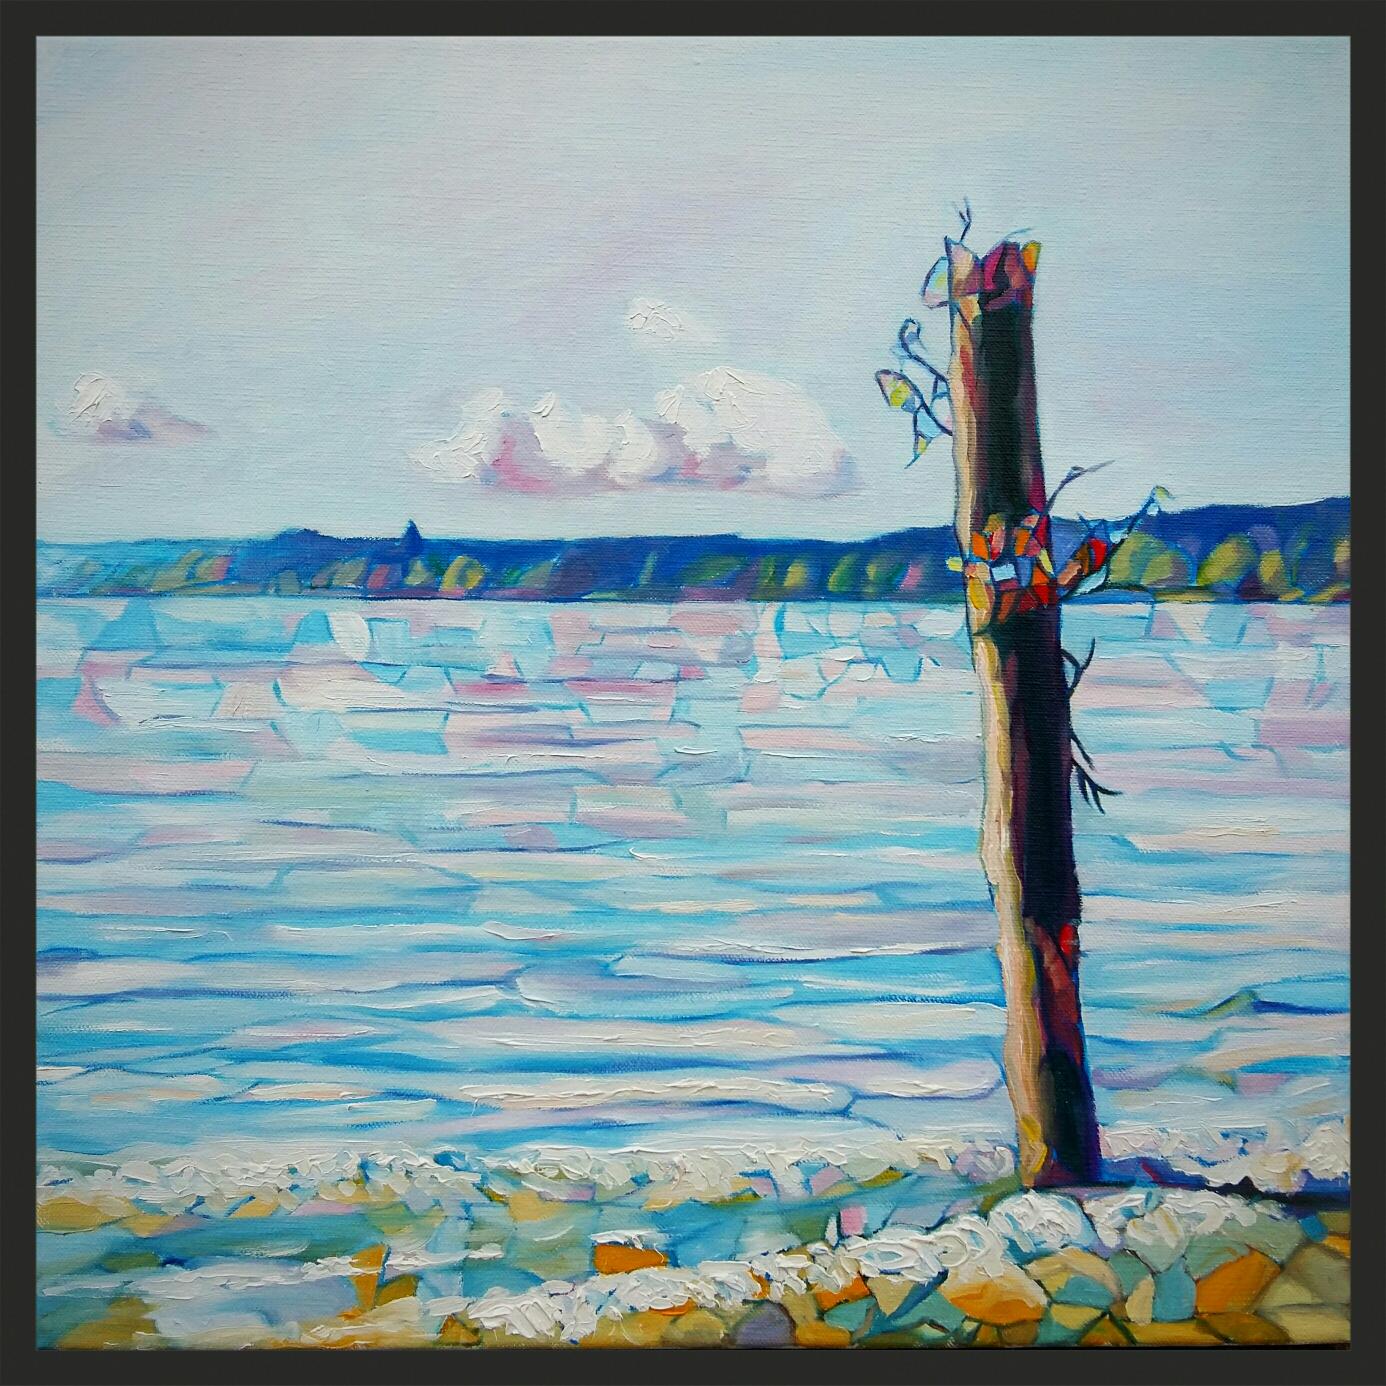 Ammersee-Impression, 40 x 40cm, Öl auf Leinwand